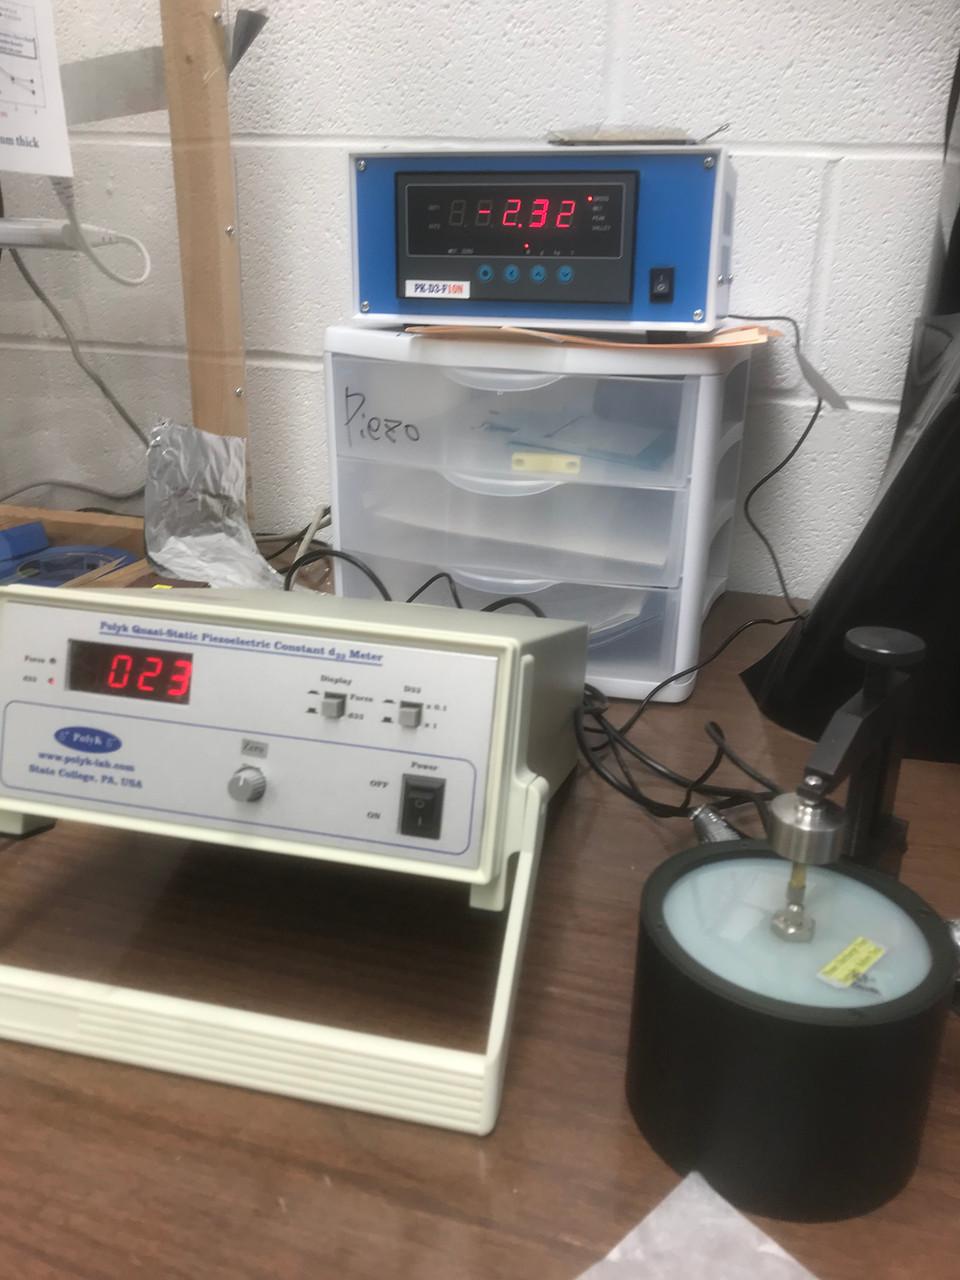 Piezoelectric coefficient d33 measurement service, up to 10 samples